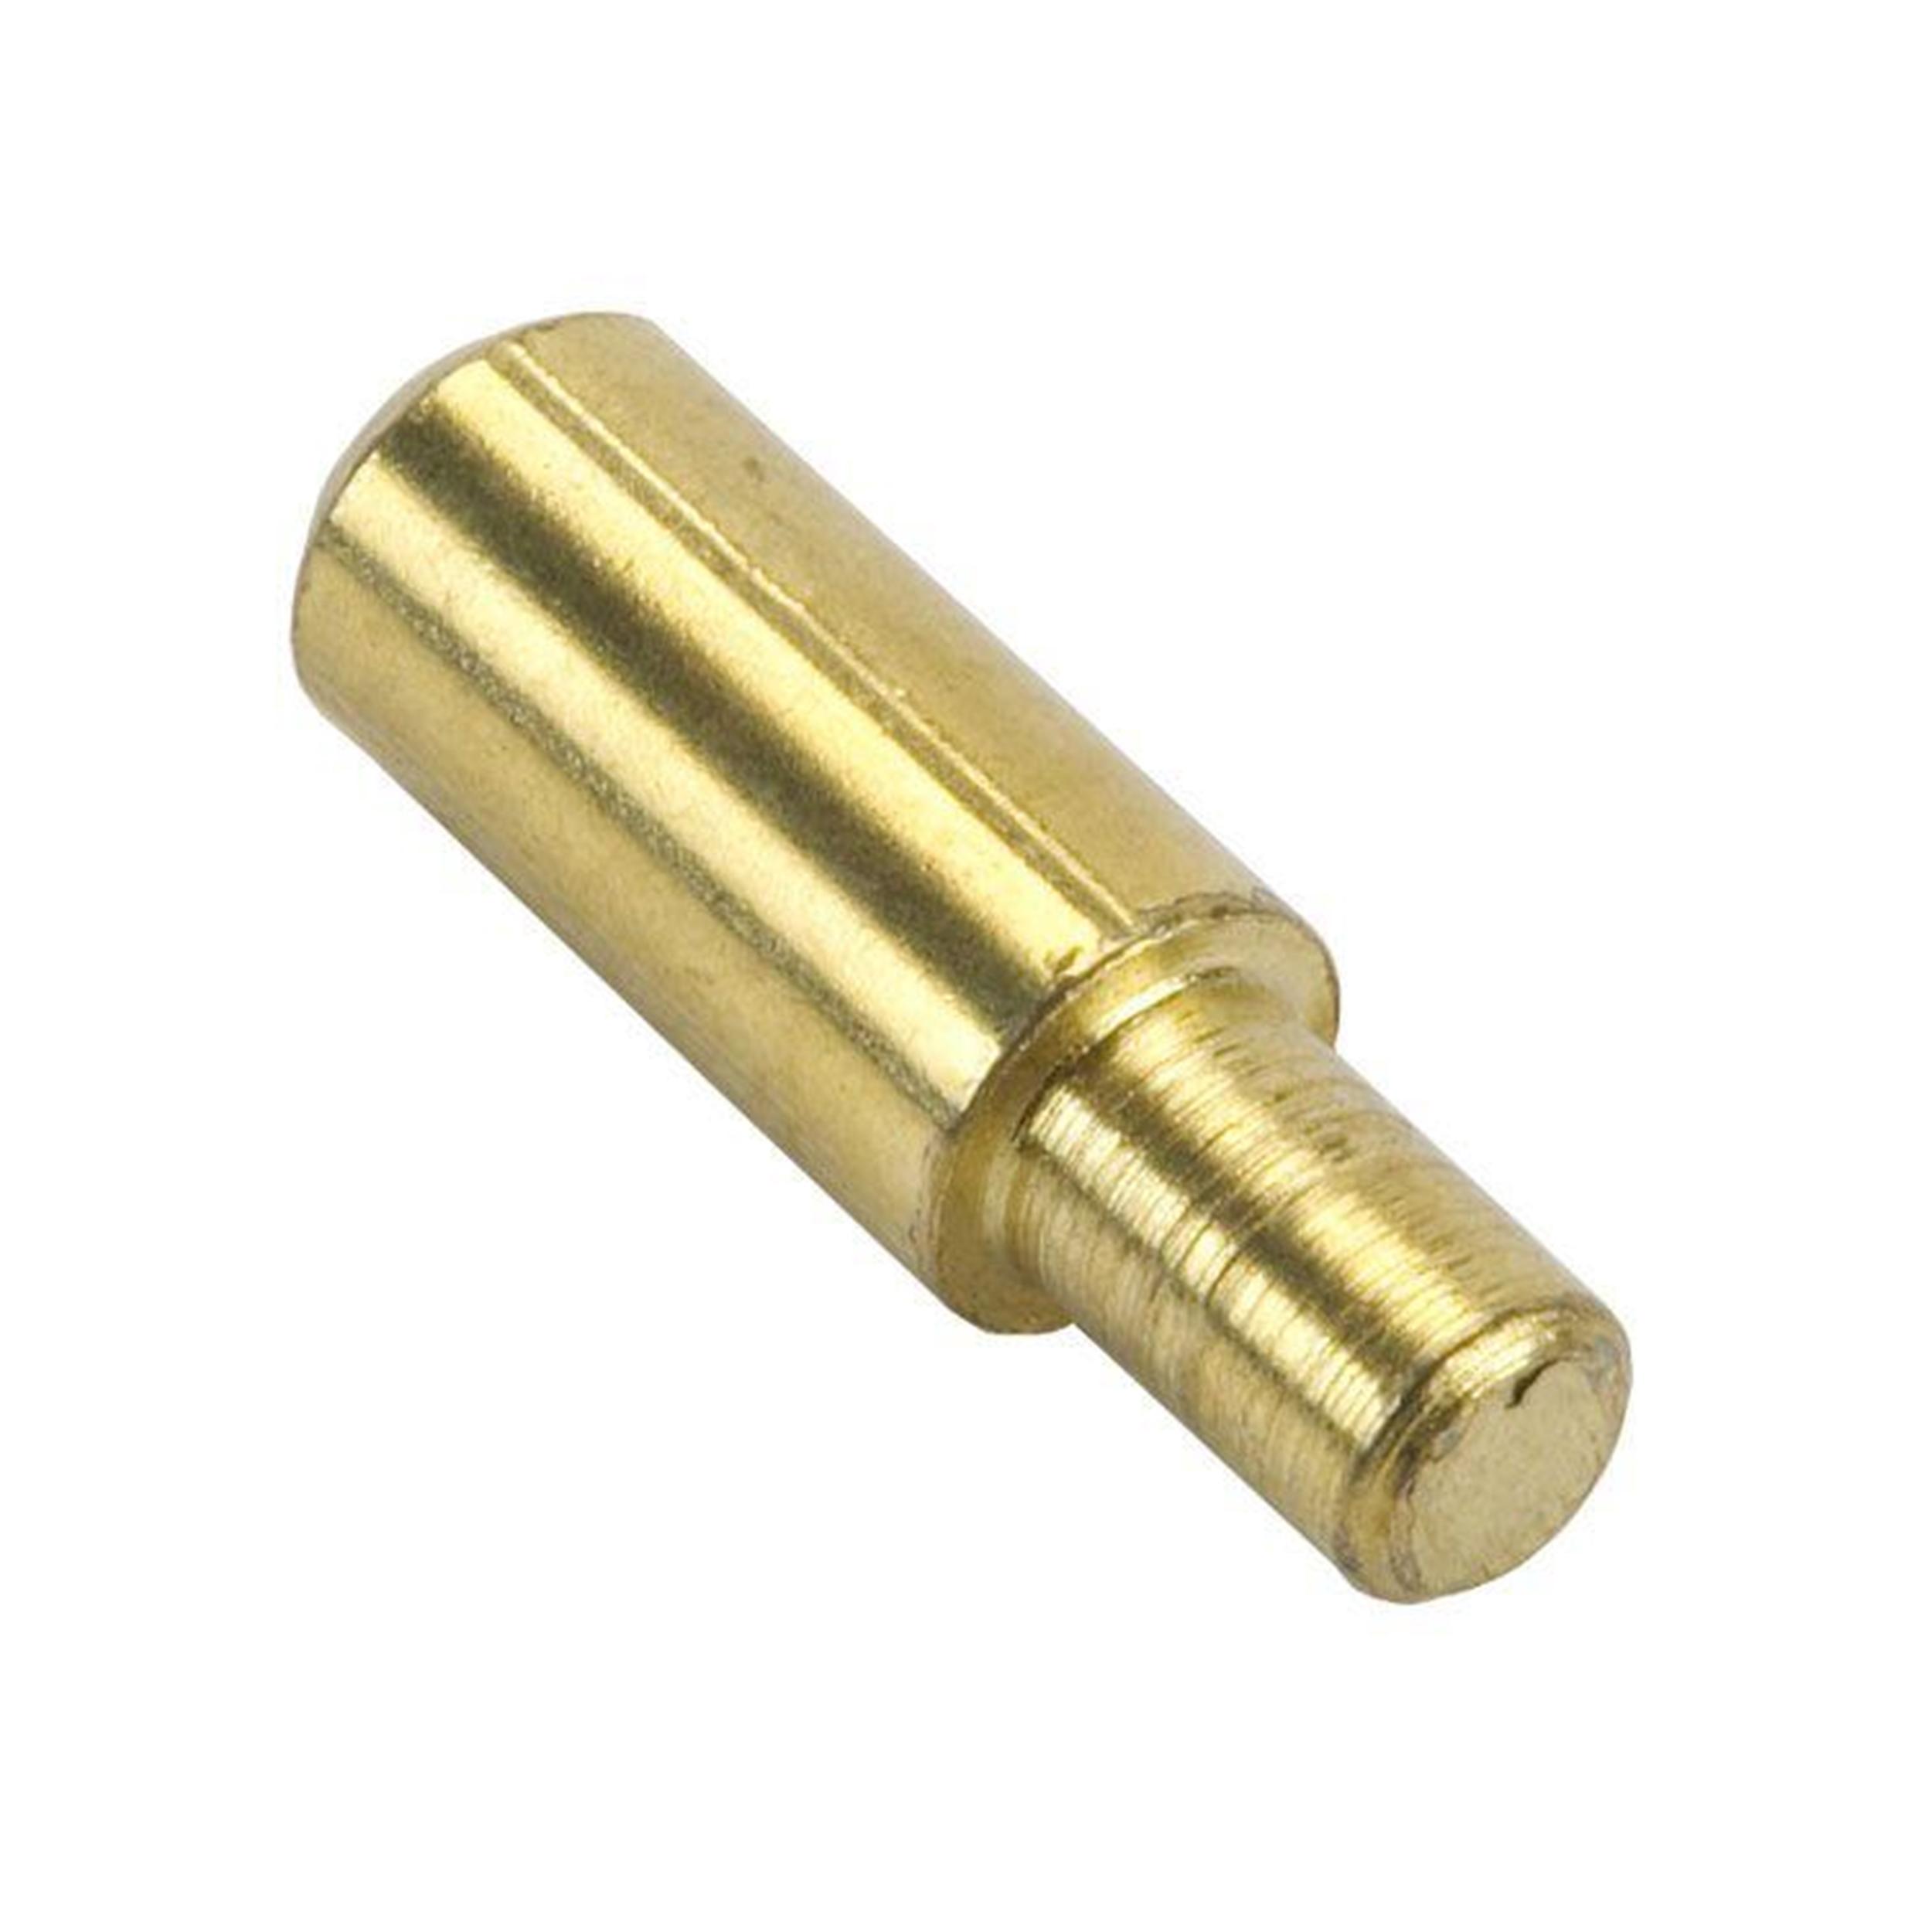 Shelf Support Pin, Round Brass, 5 mm, 20 pack